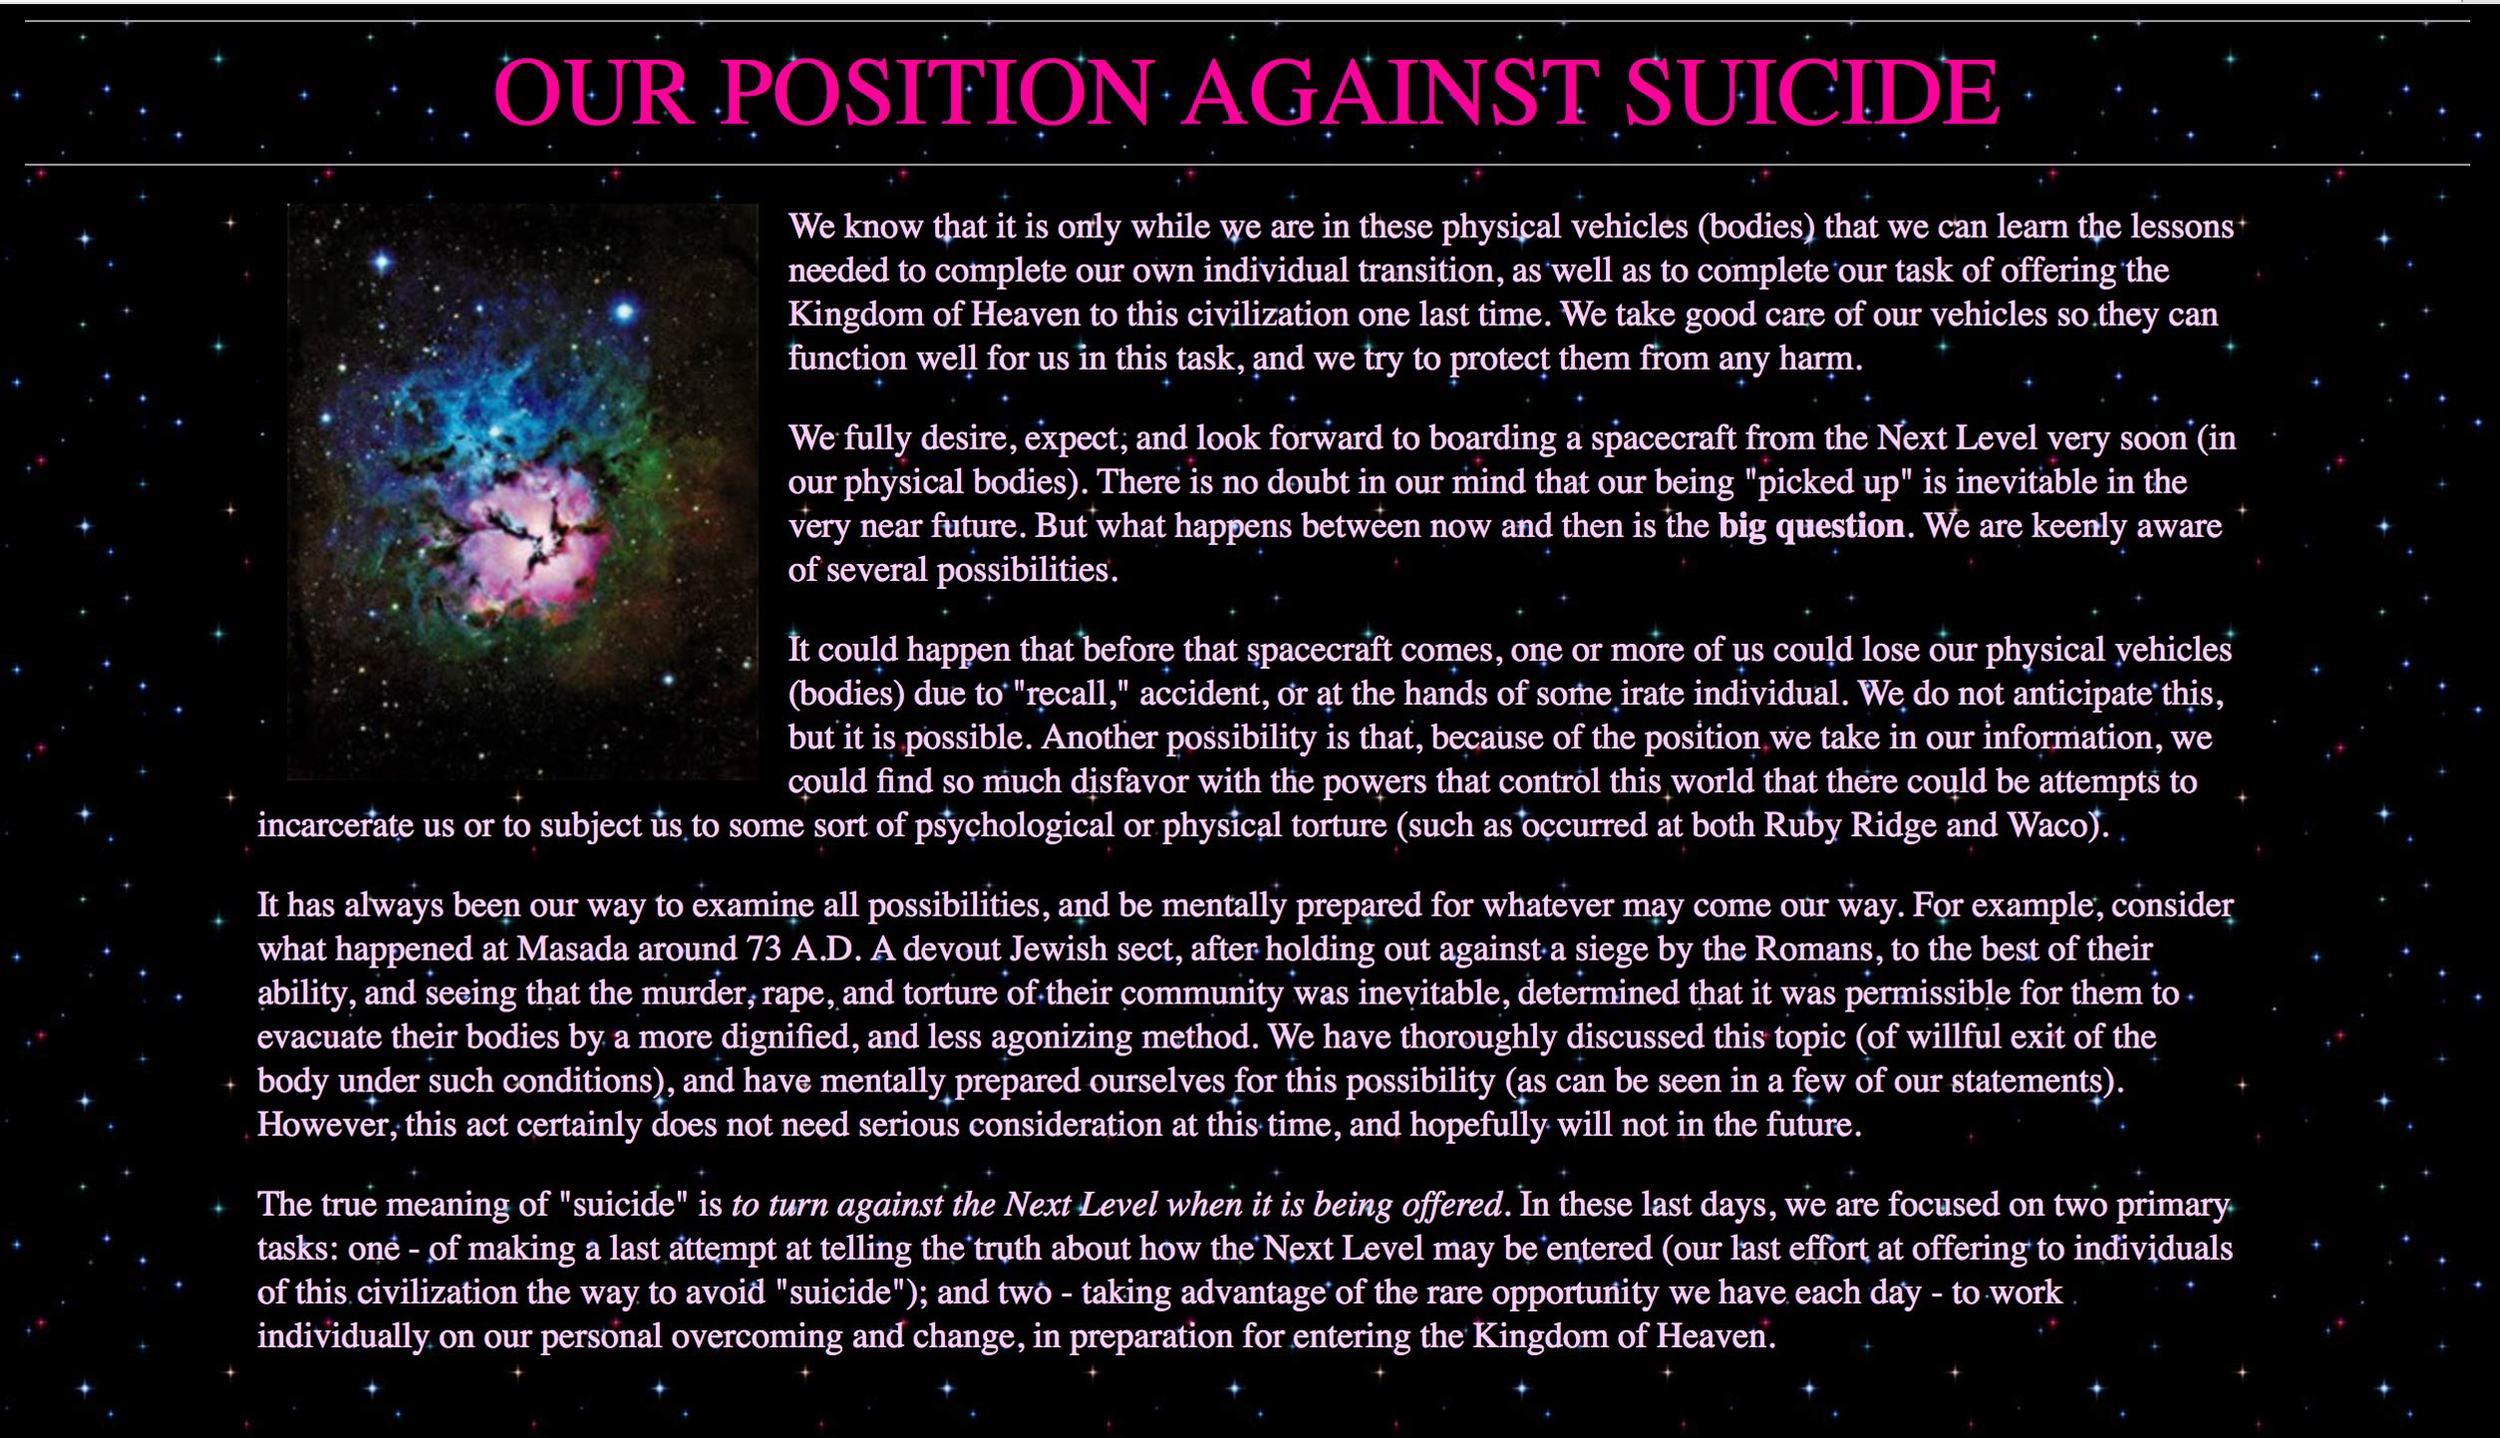 Heaven's Gate's  statement against suicide